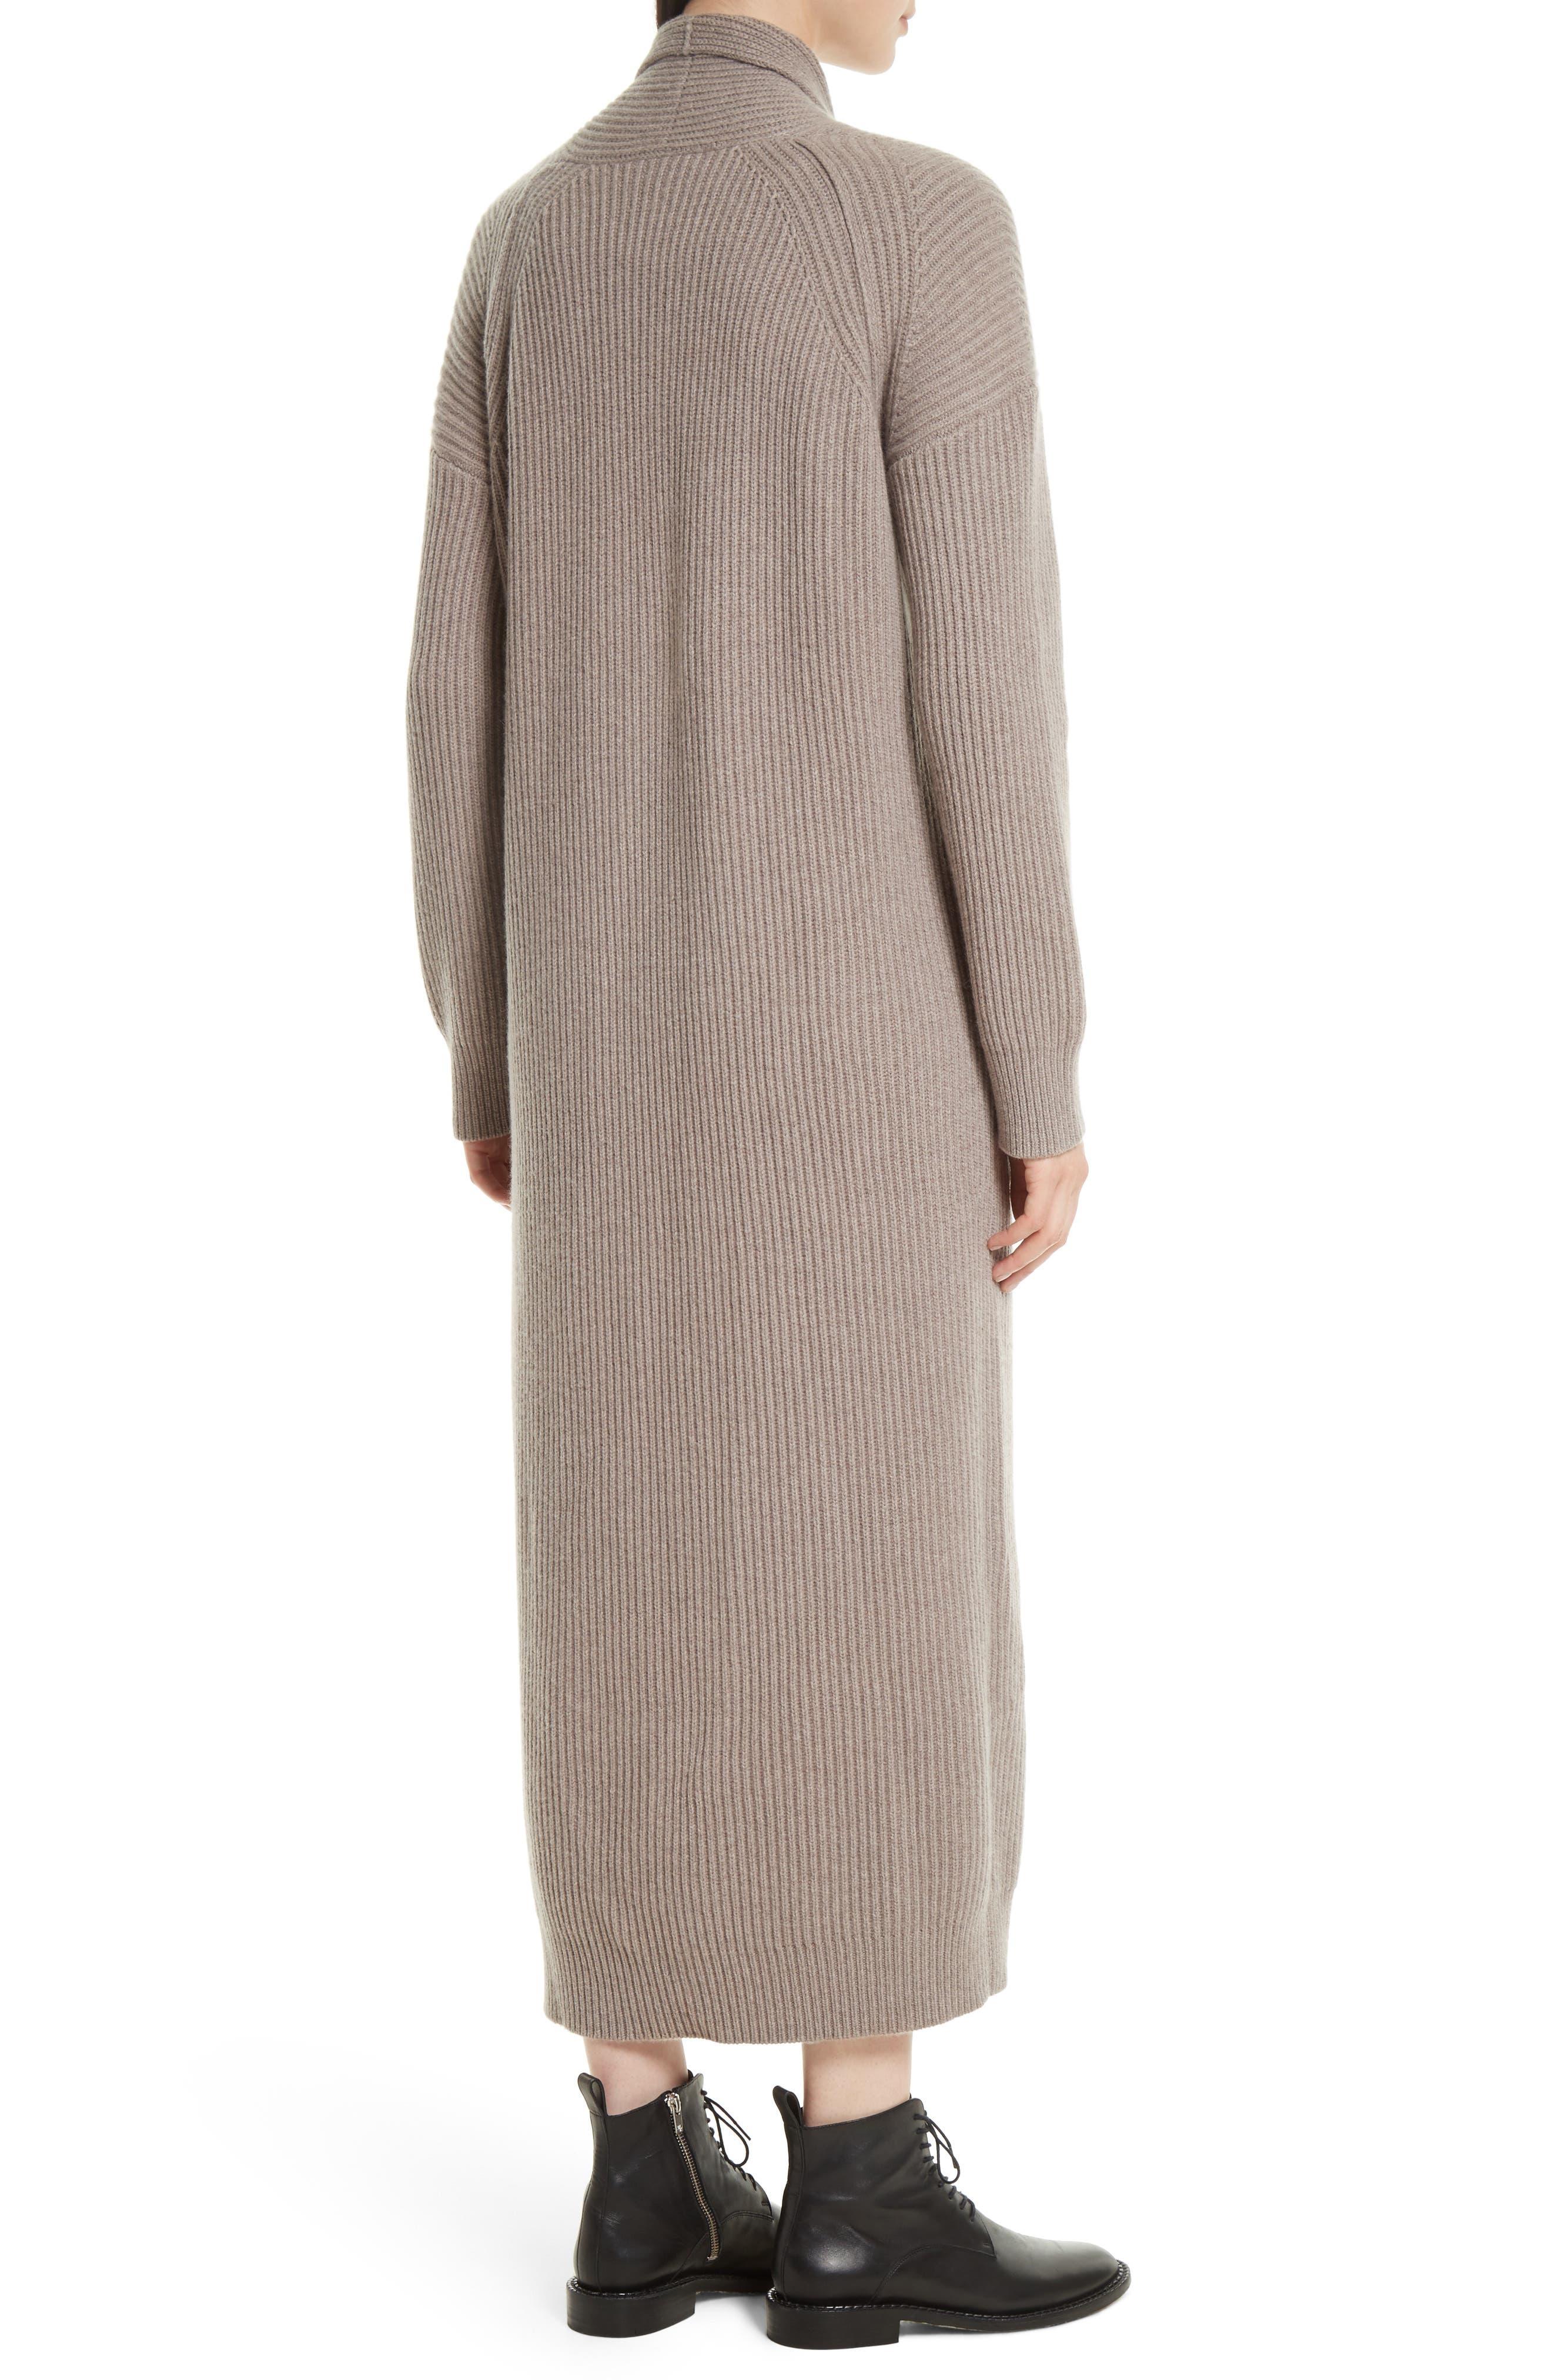 VINCE,                             Long Knit Sweater Robe,                             Alternate thumbnail 2, color,                             260